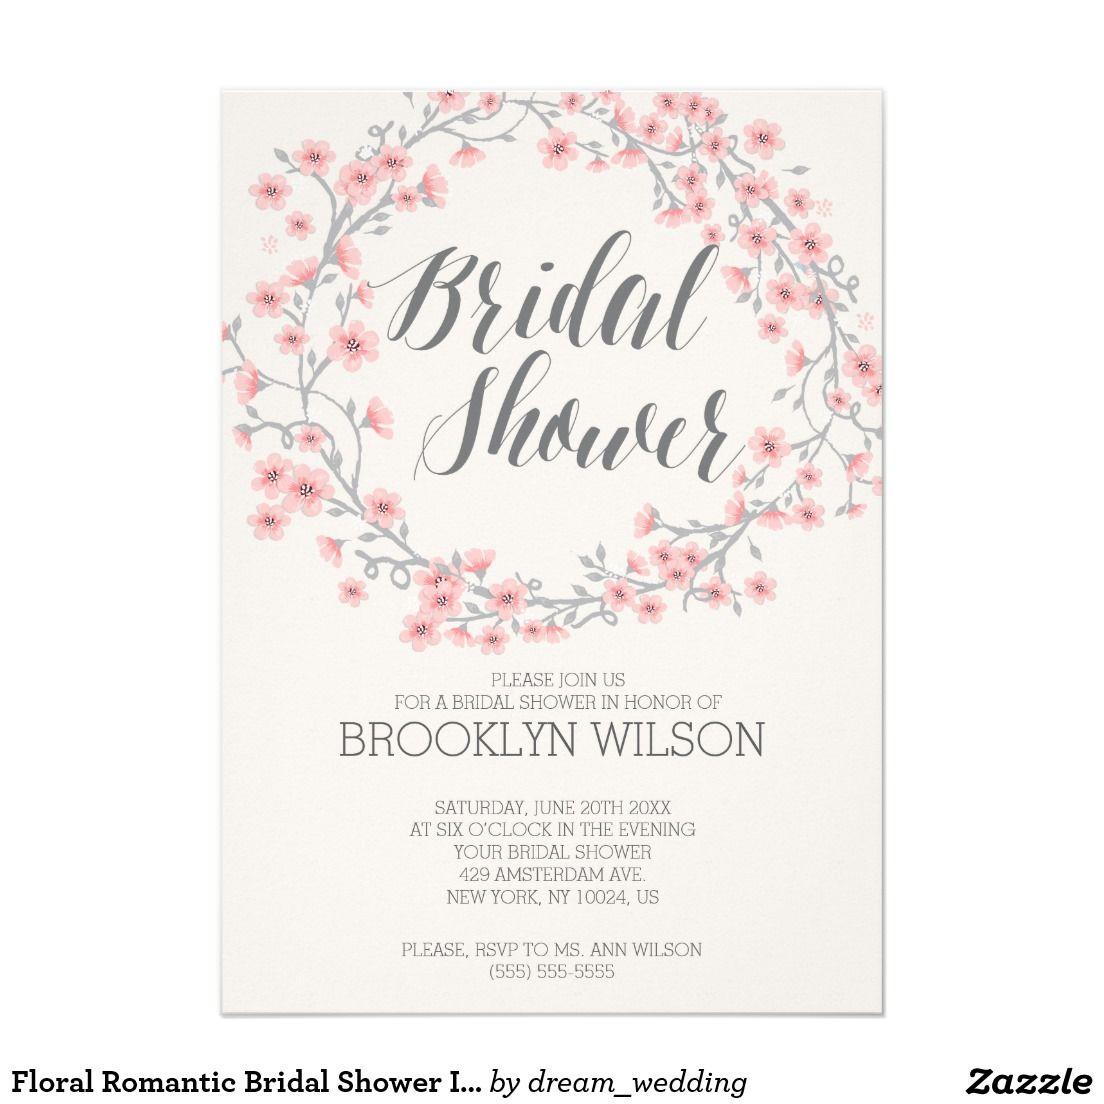 Floral romantic bridal shower invites pink wreath wedding wreath floral romantic bridal shower invites pink wreath filmwisefo Choice Image